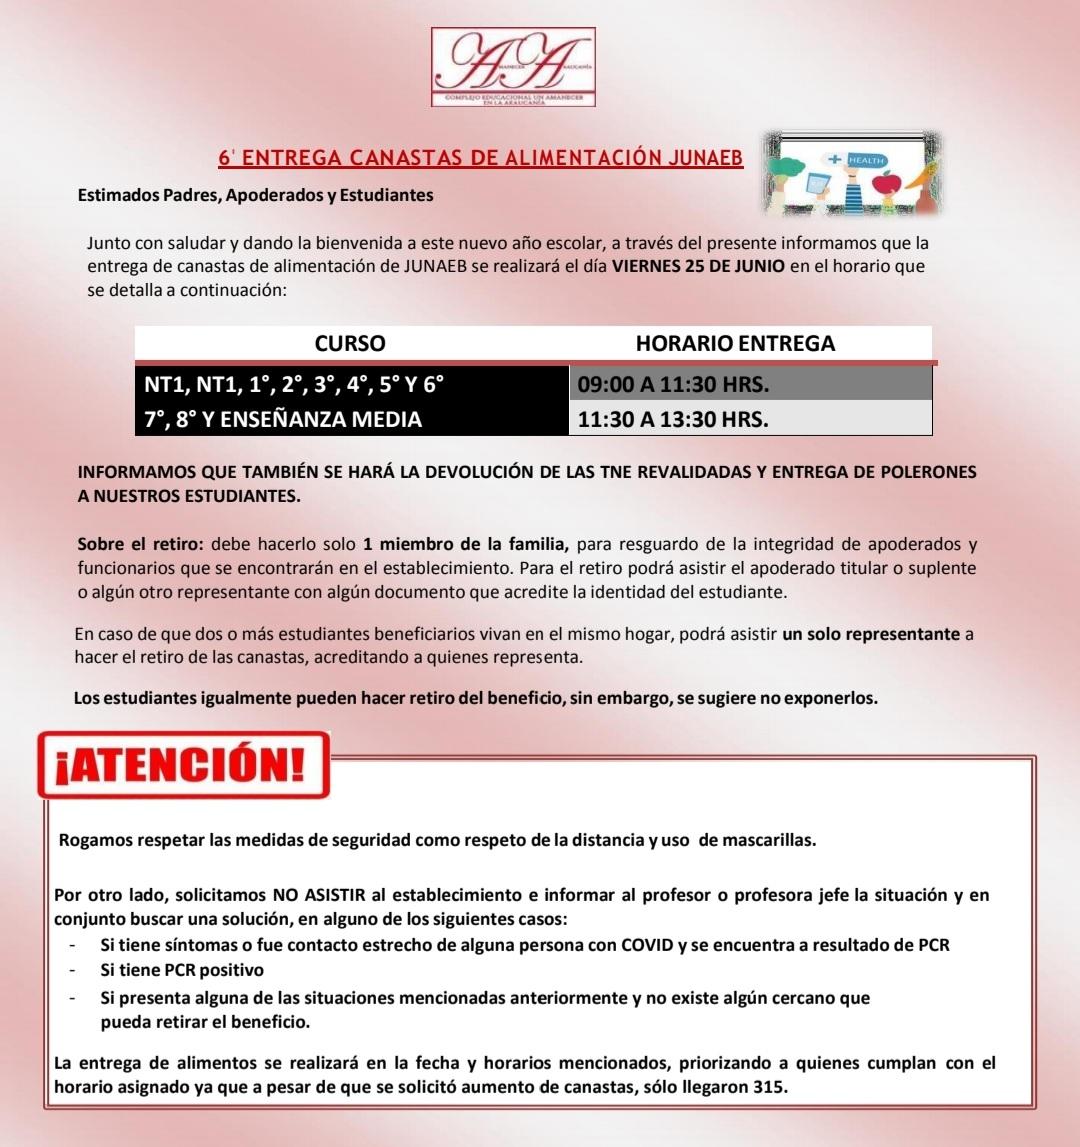 6° ENTREGA CANASTAS JUNAEB Y POLAR INSTITUCIONAL